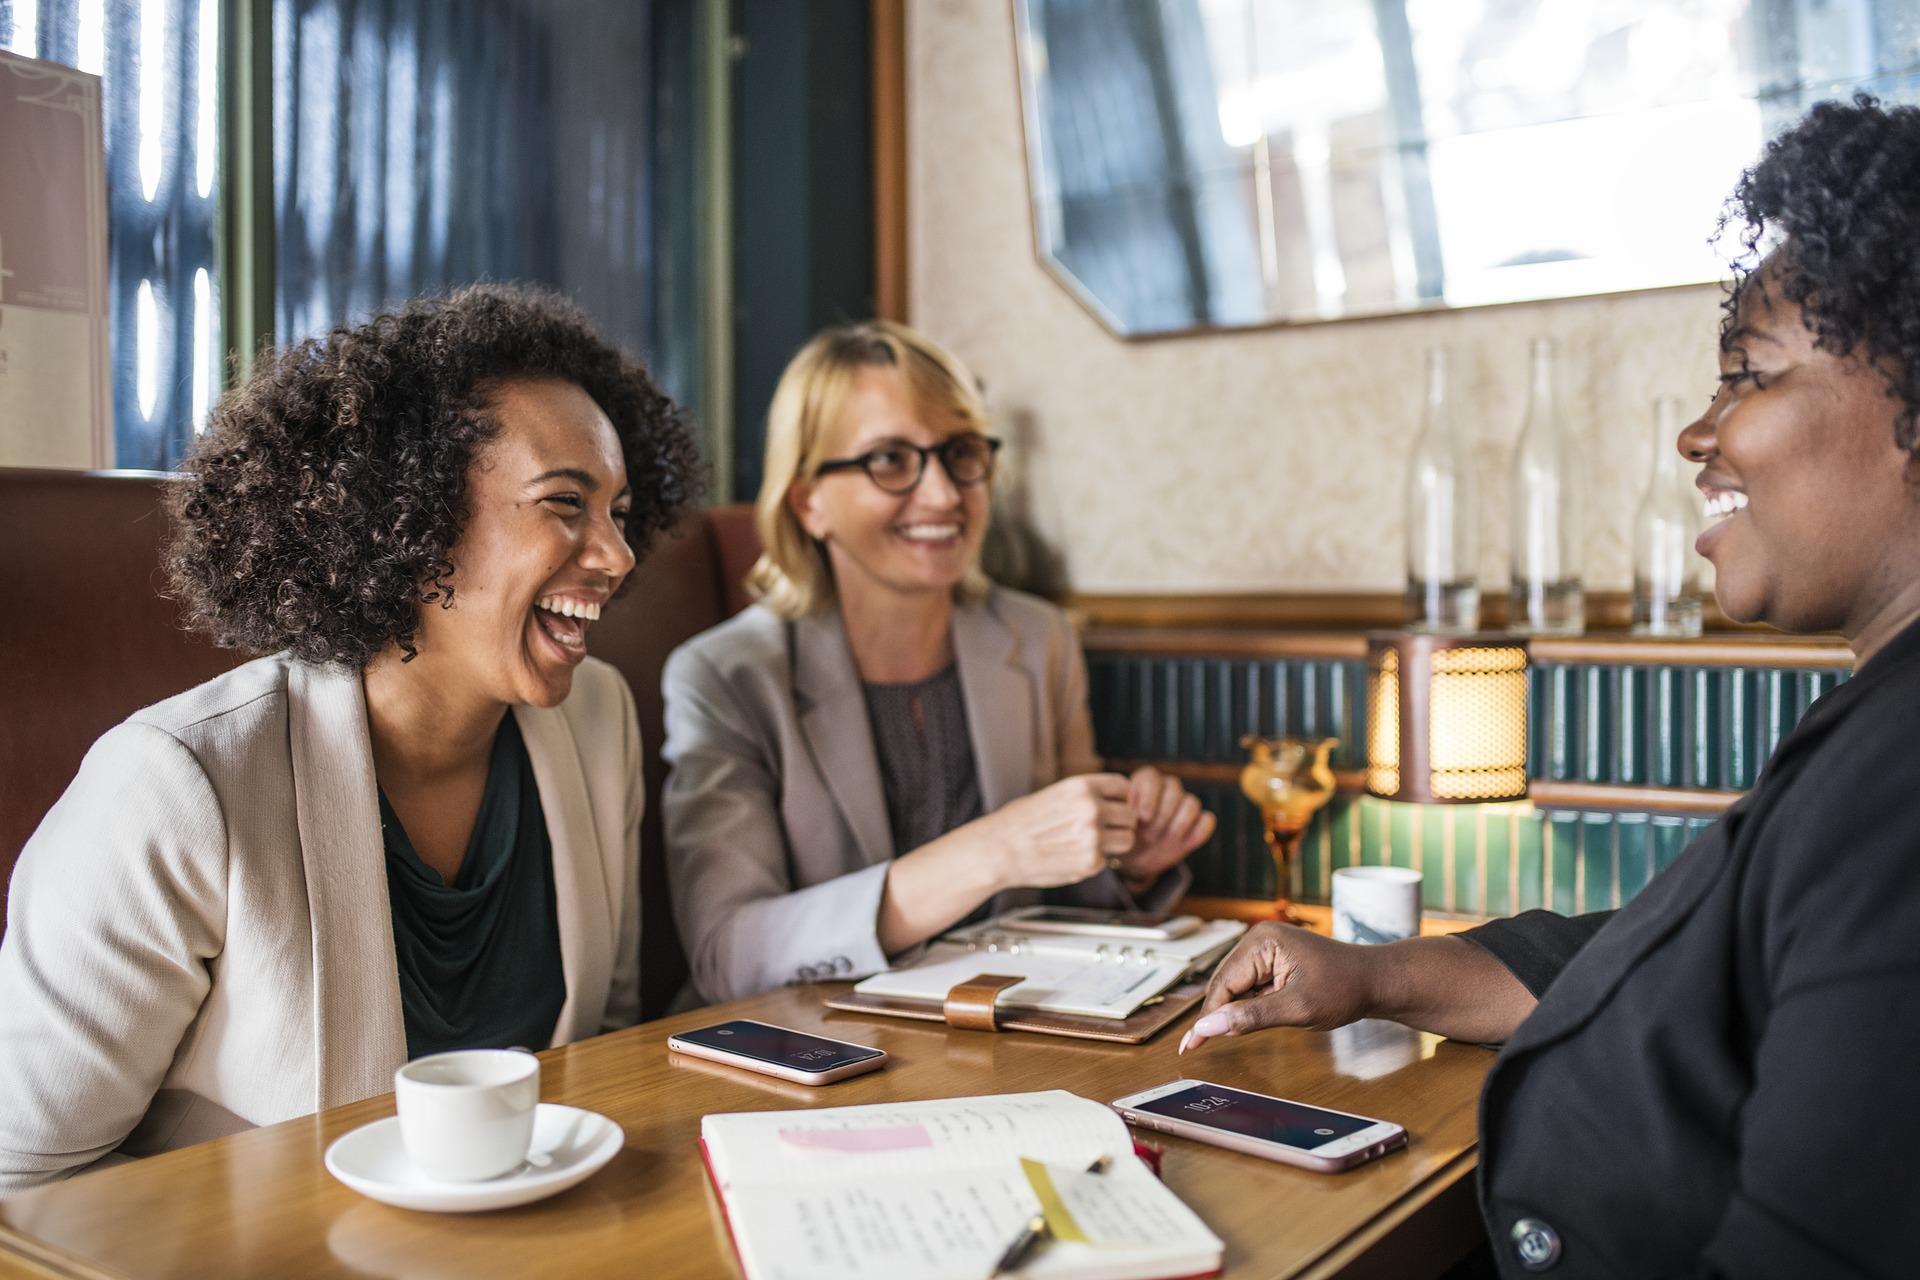 Three women having conversation